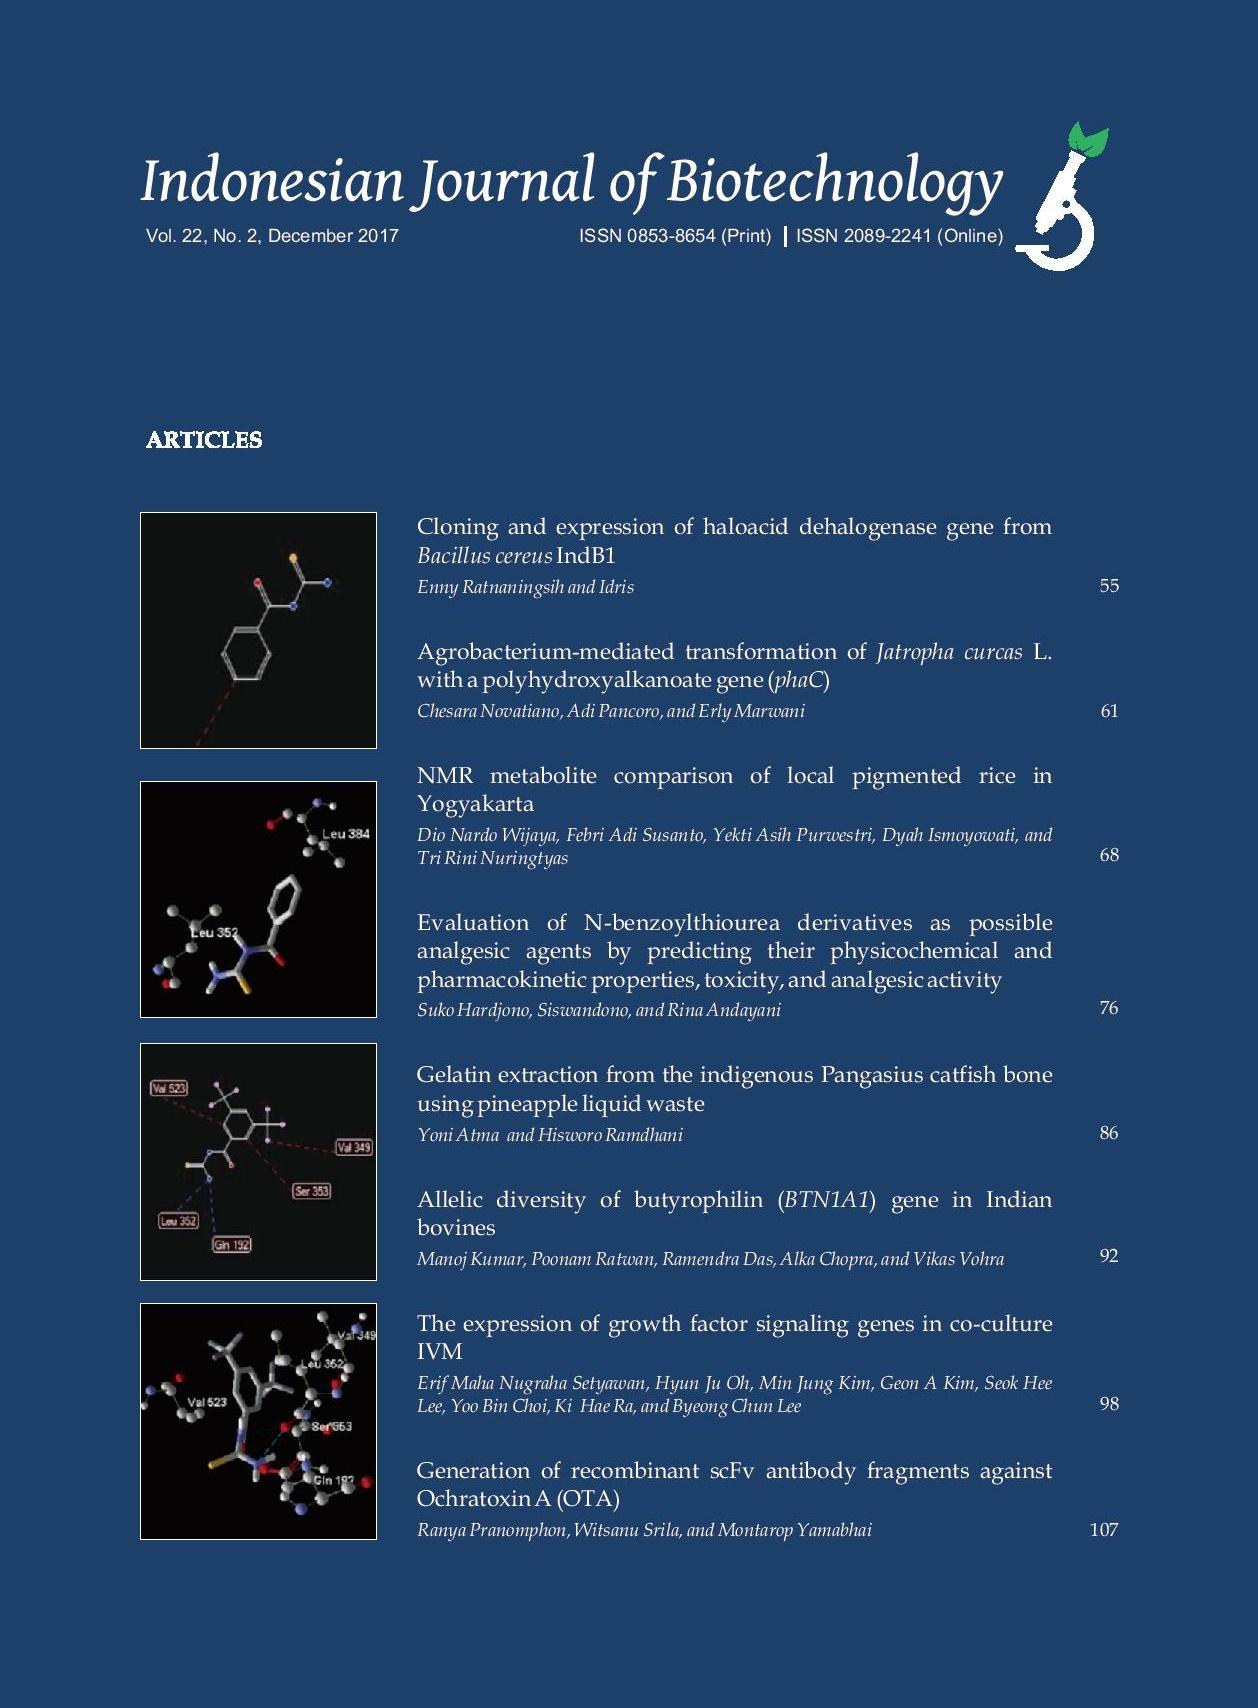 IJBiotech Vol. 22 No. 2